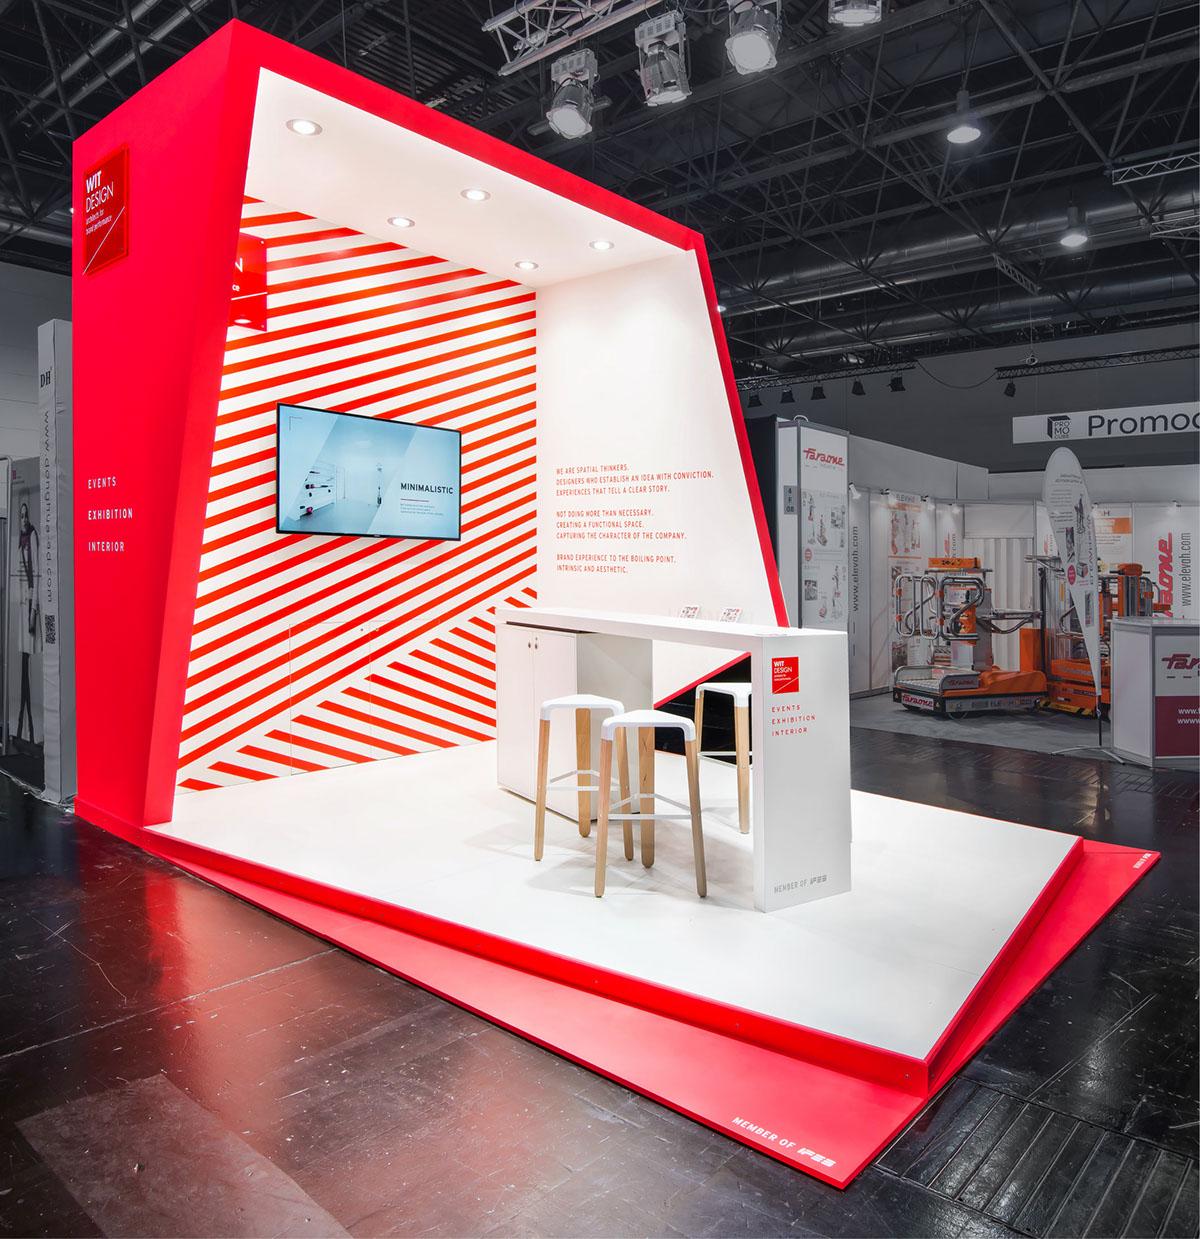 Exhibition Stand Design Trends 2017 : Wit design euroshop on behance